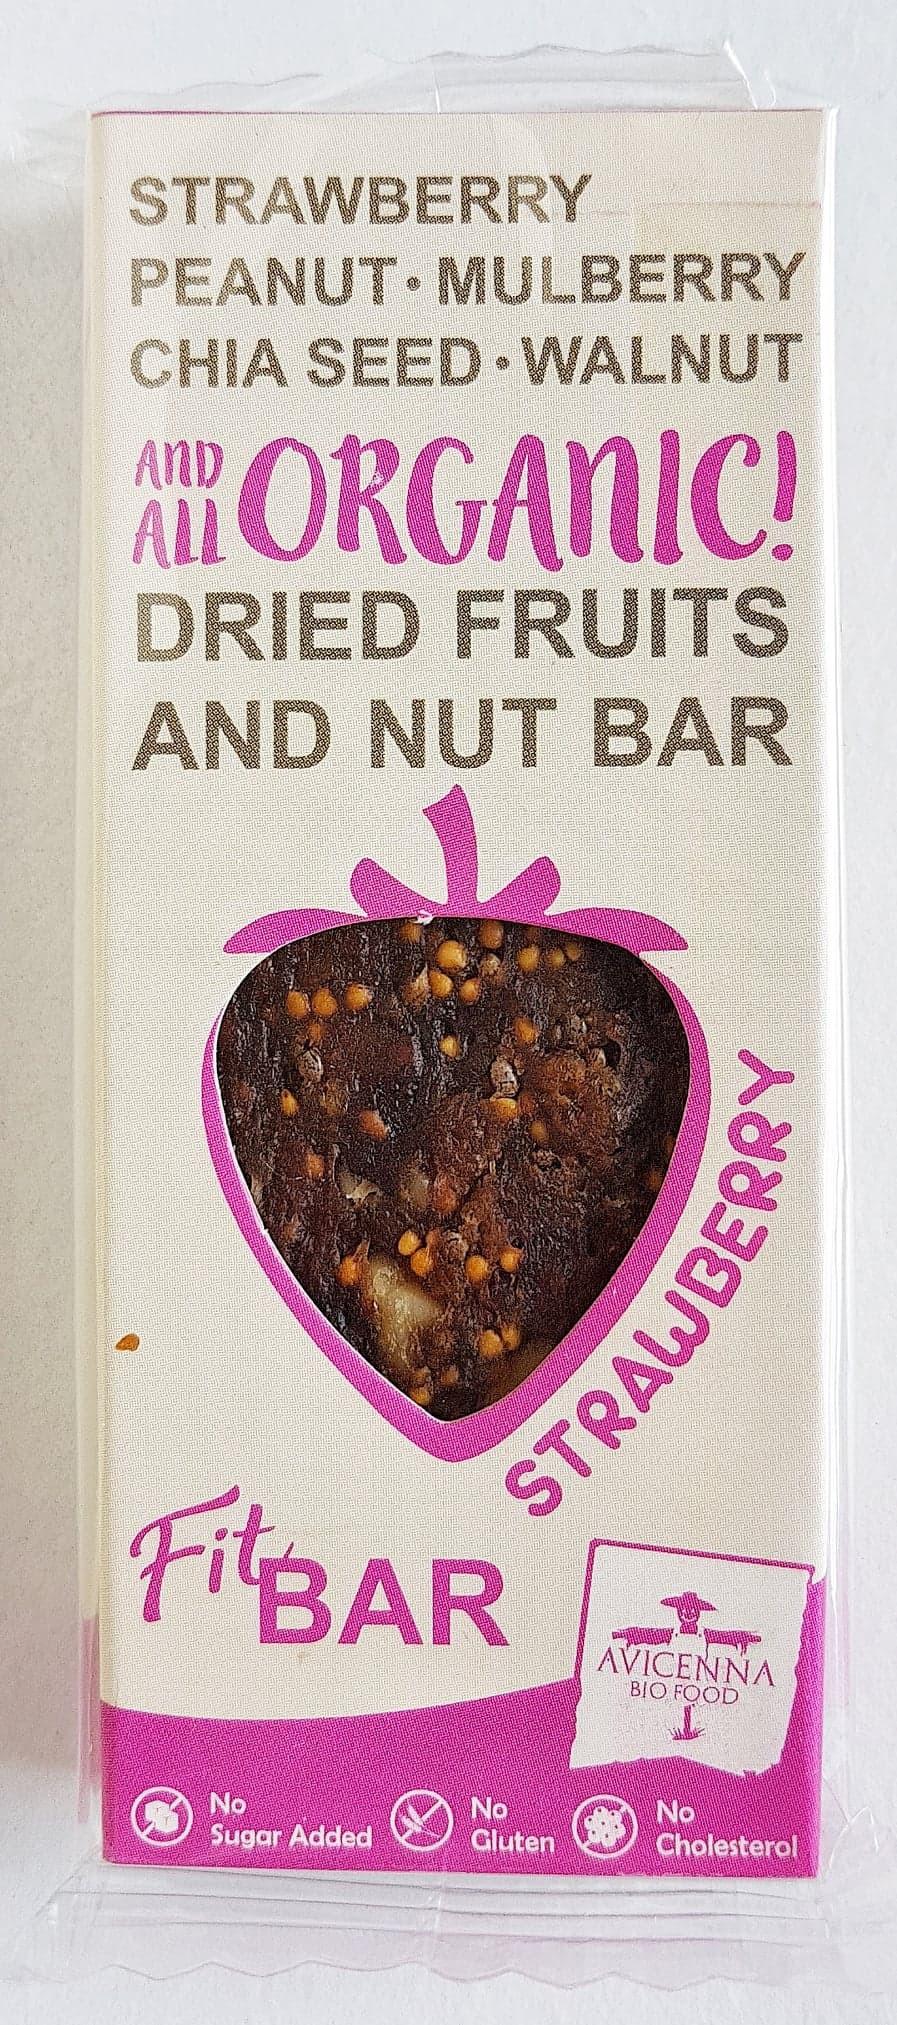 Avicenna Bio Food Fit Bar Strawberry